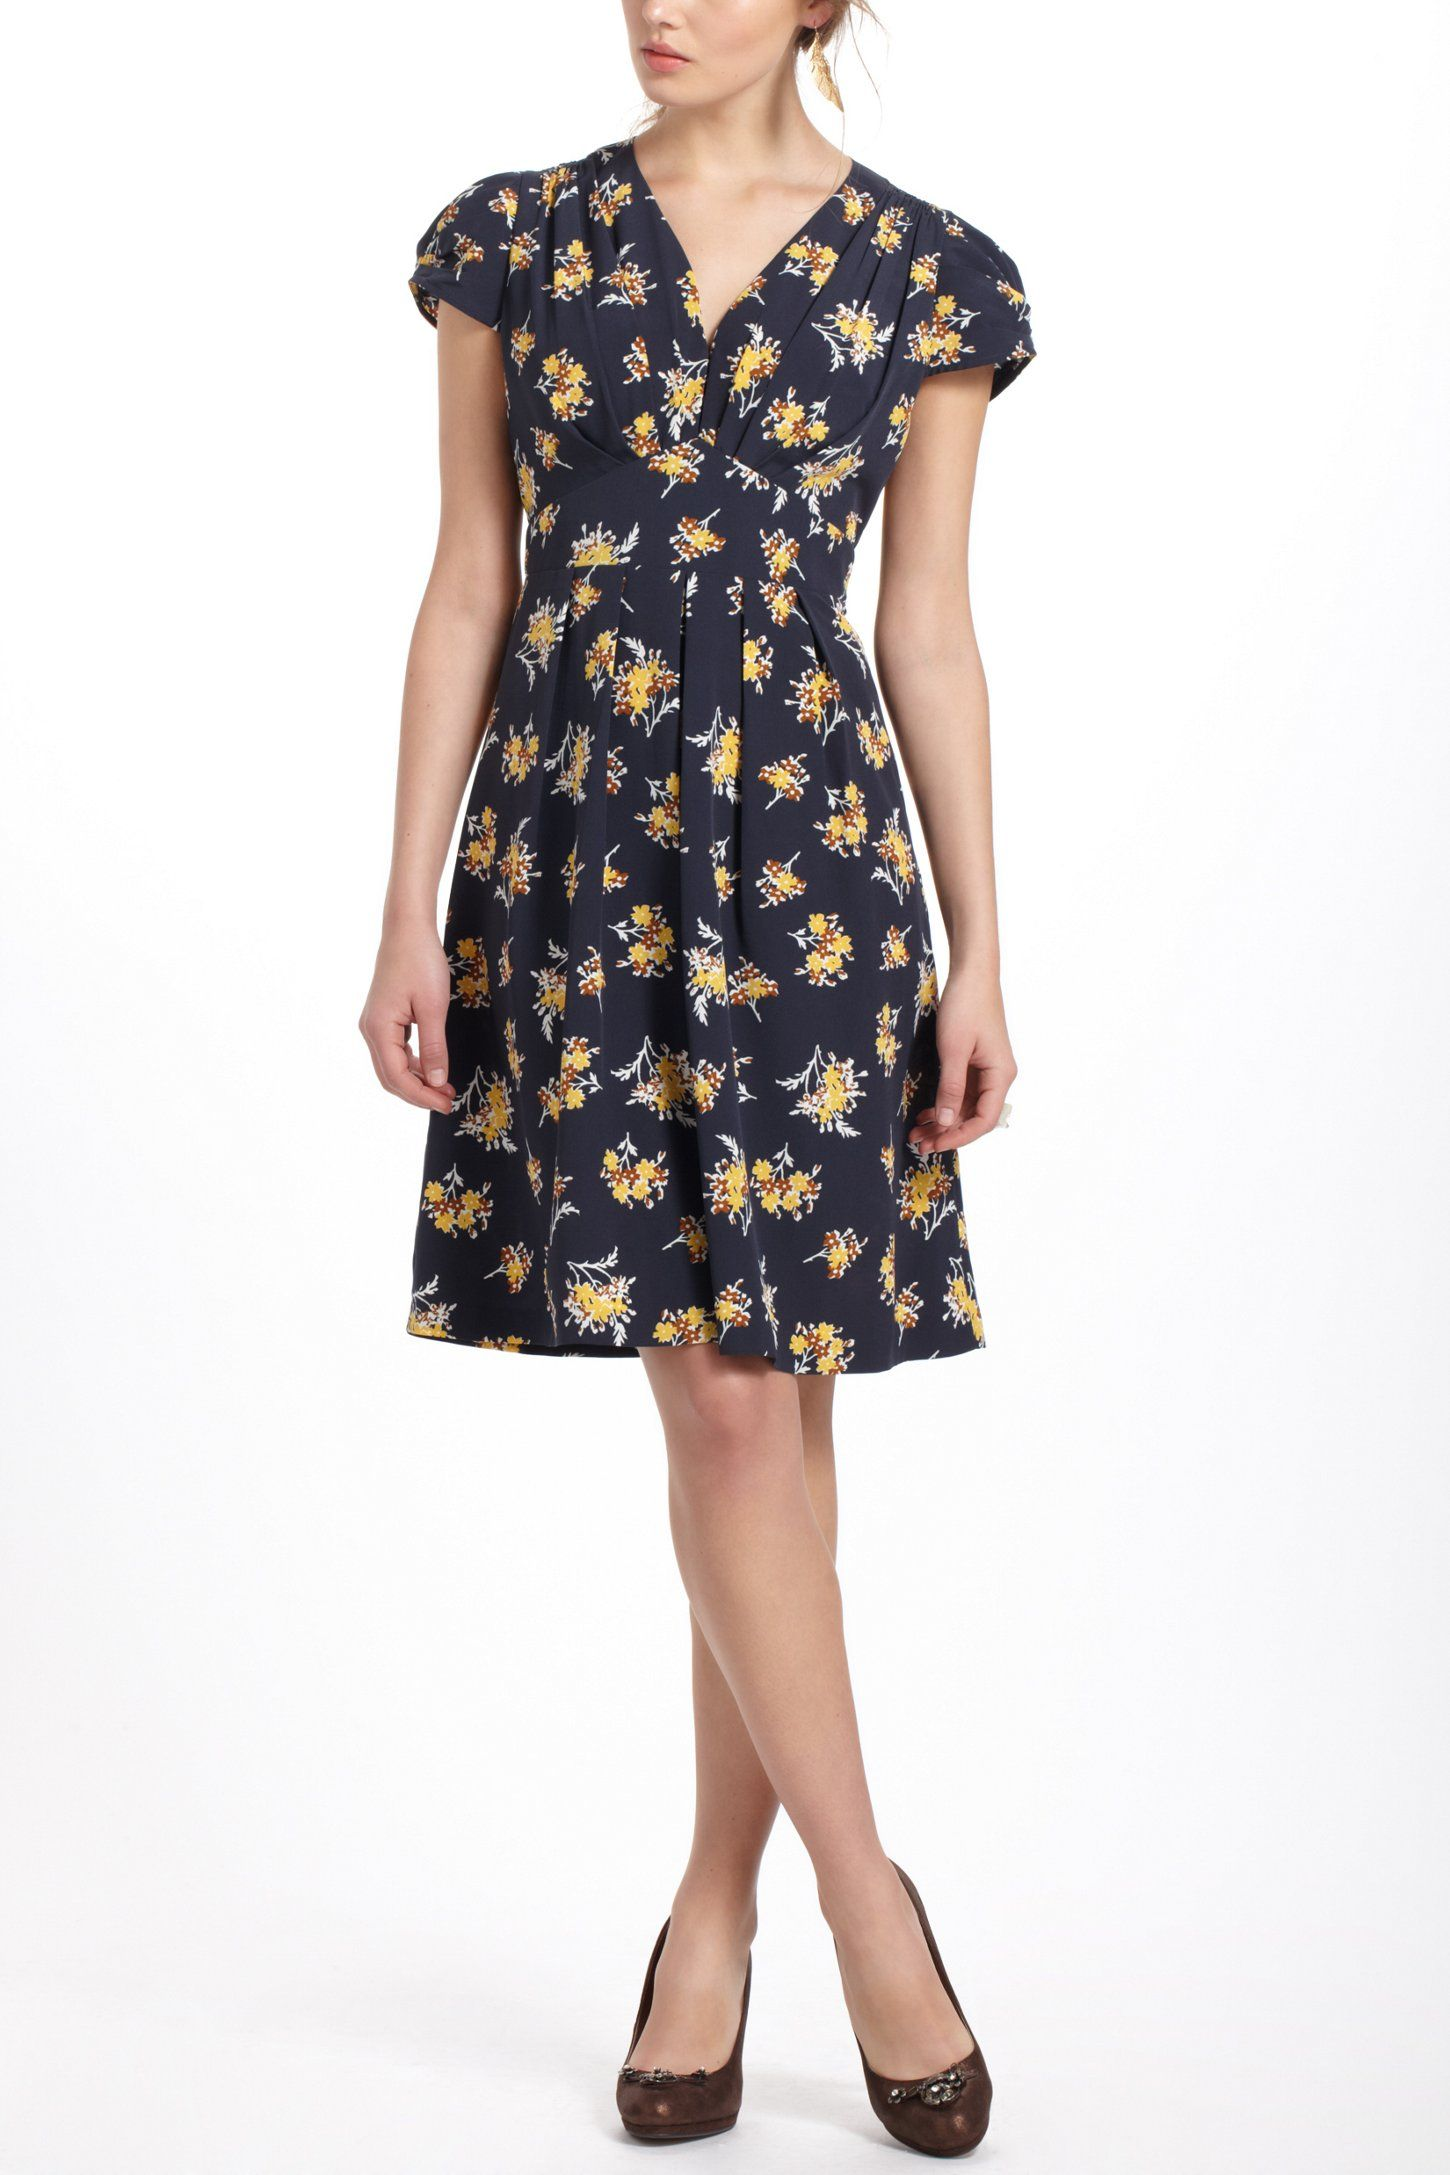 fd202c9c7ed6 Penrose Dress - Anthropologie.com